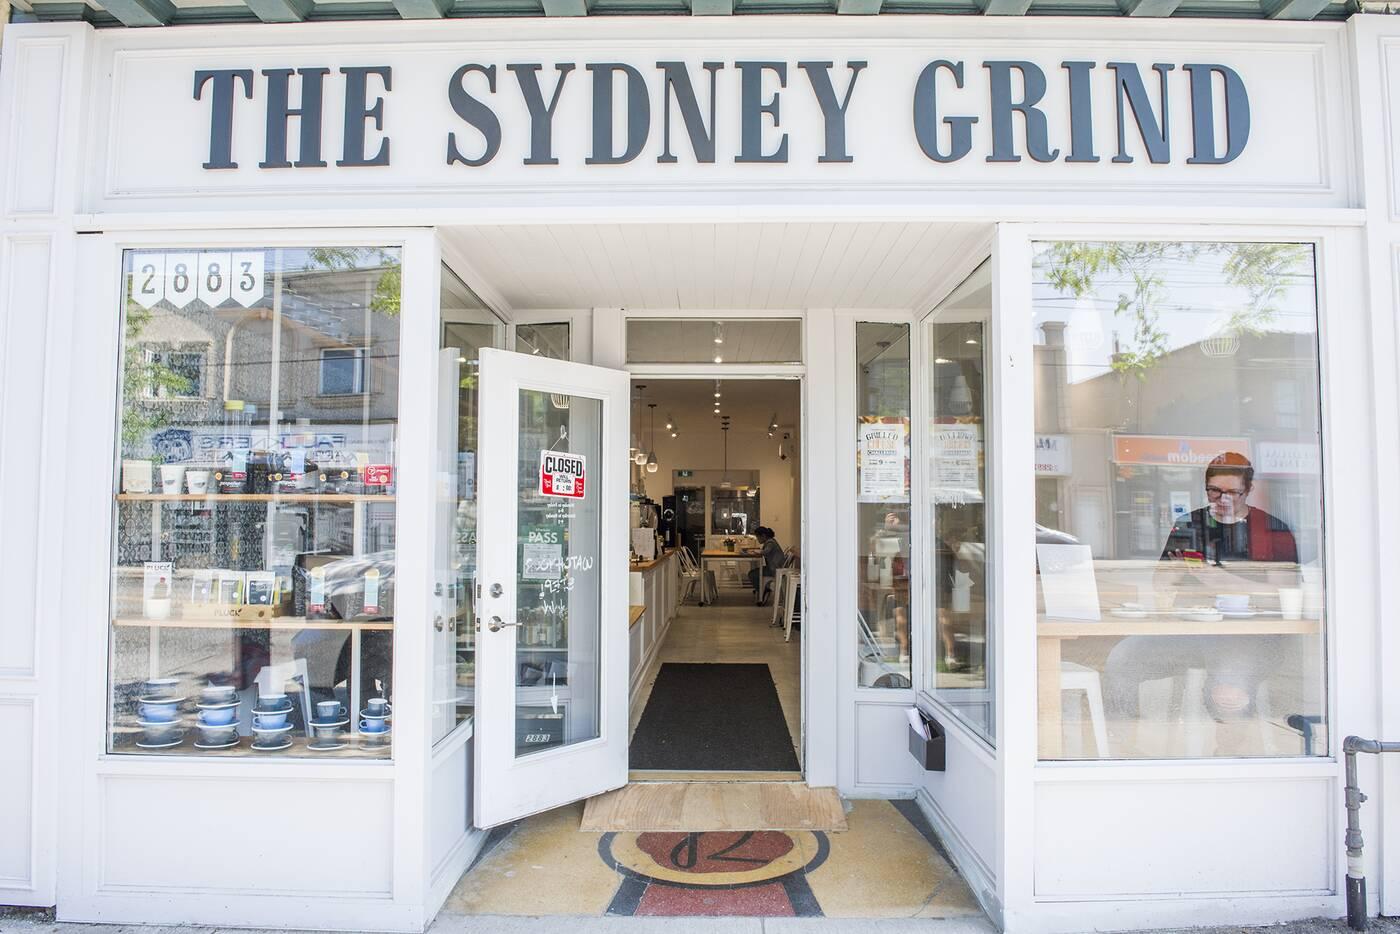 Sydney Grind Toronto